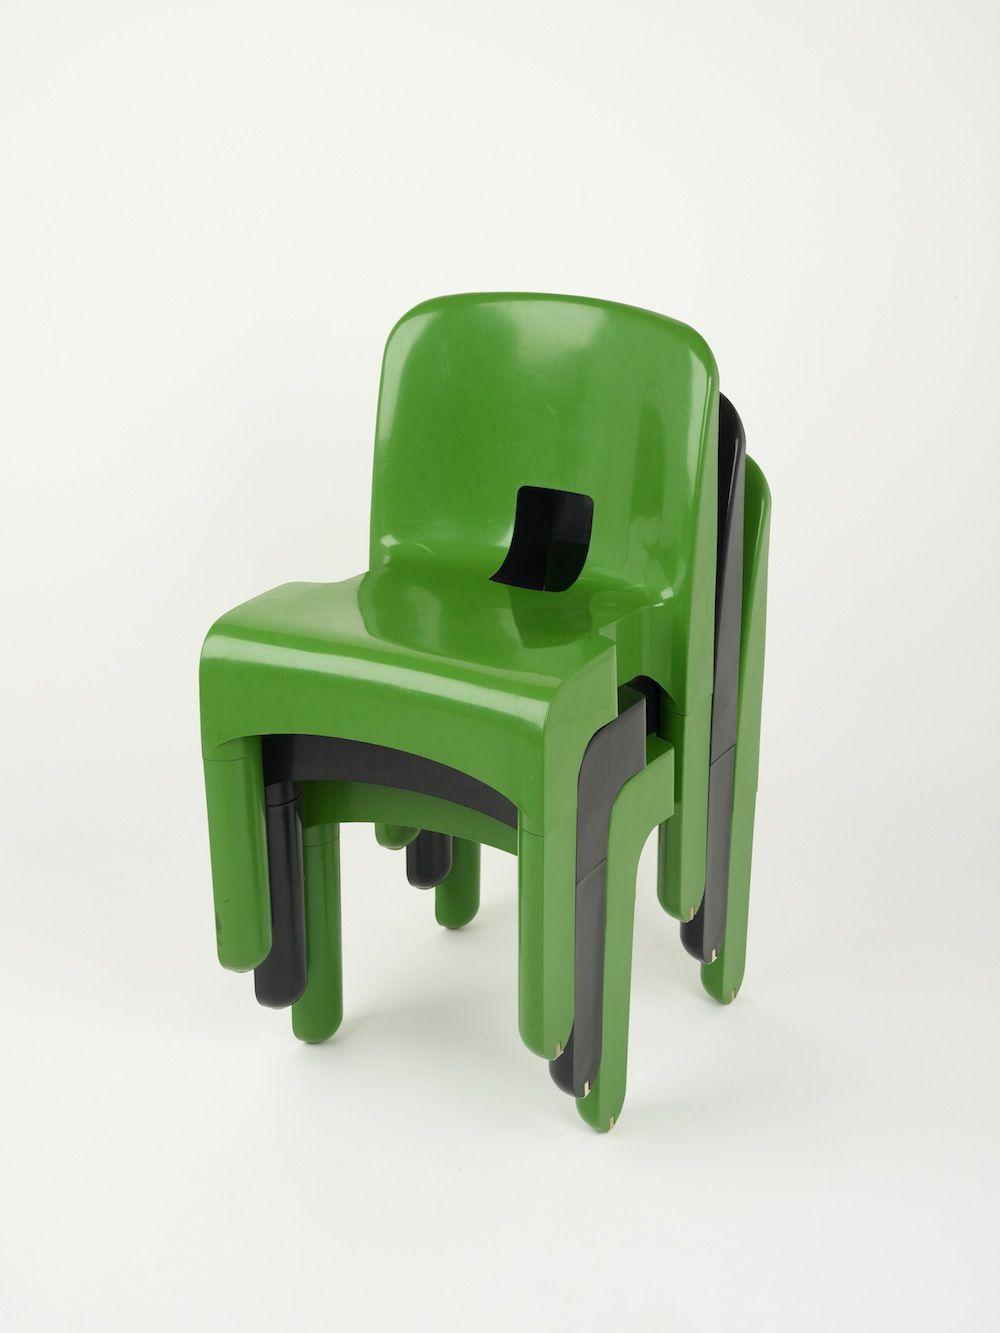 Universal stacking chair by joe colombo 1968 joe for Stuhl design geschichte